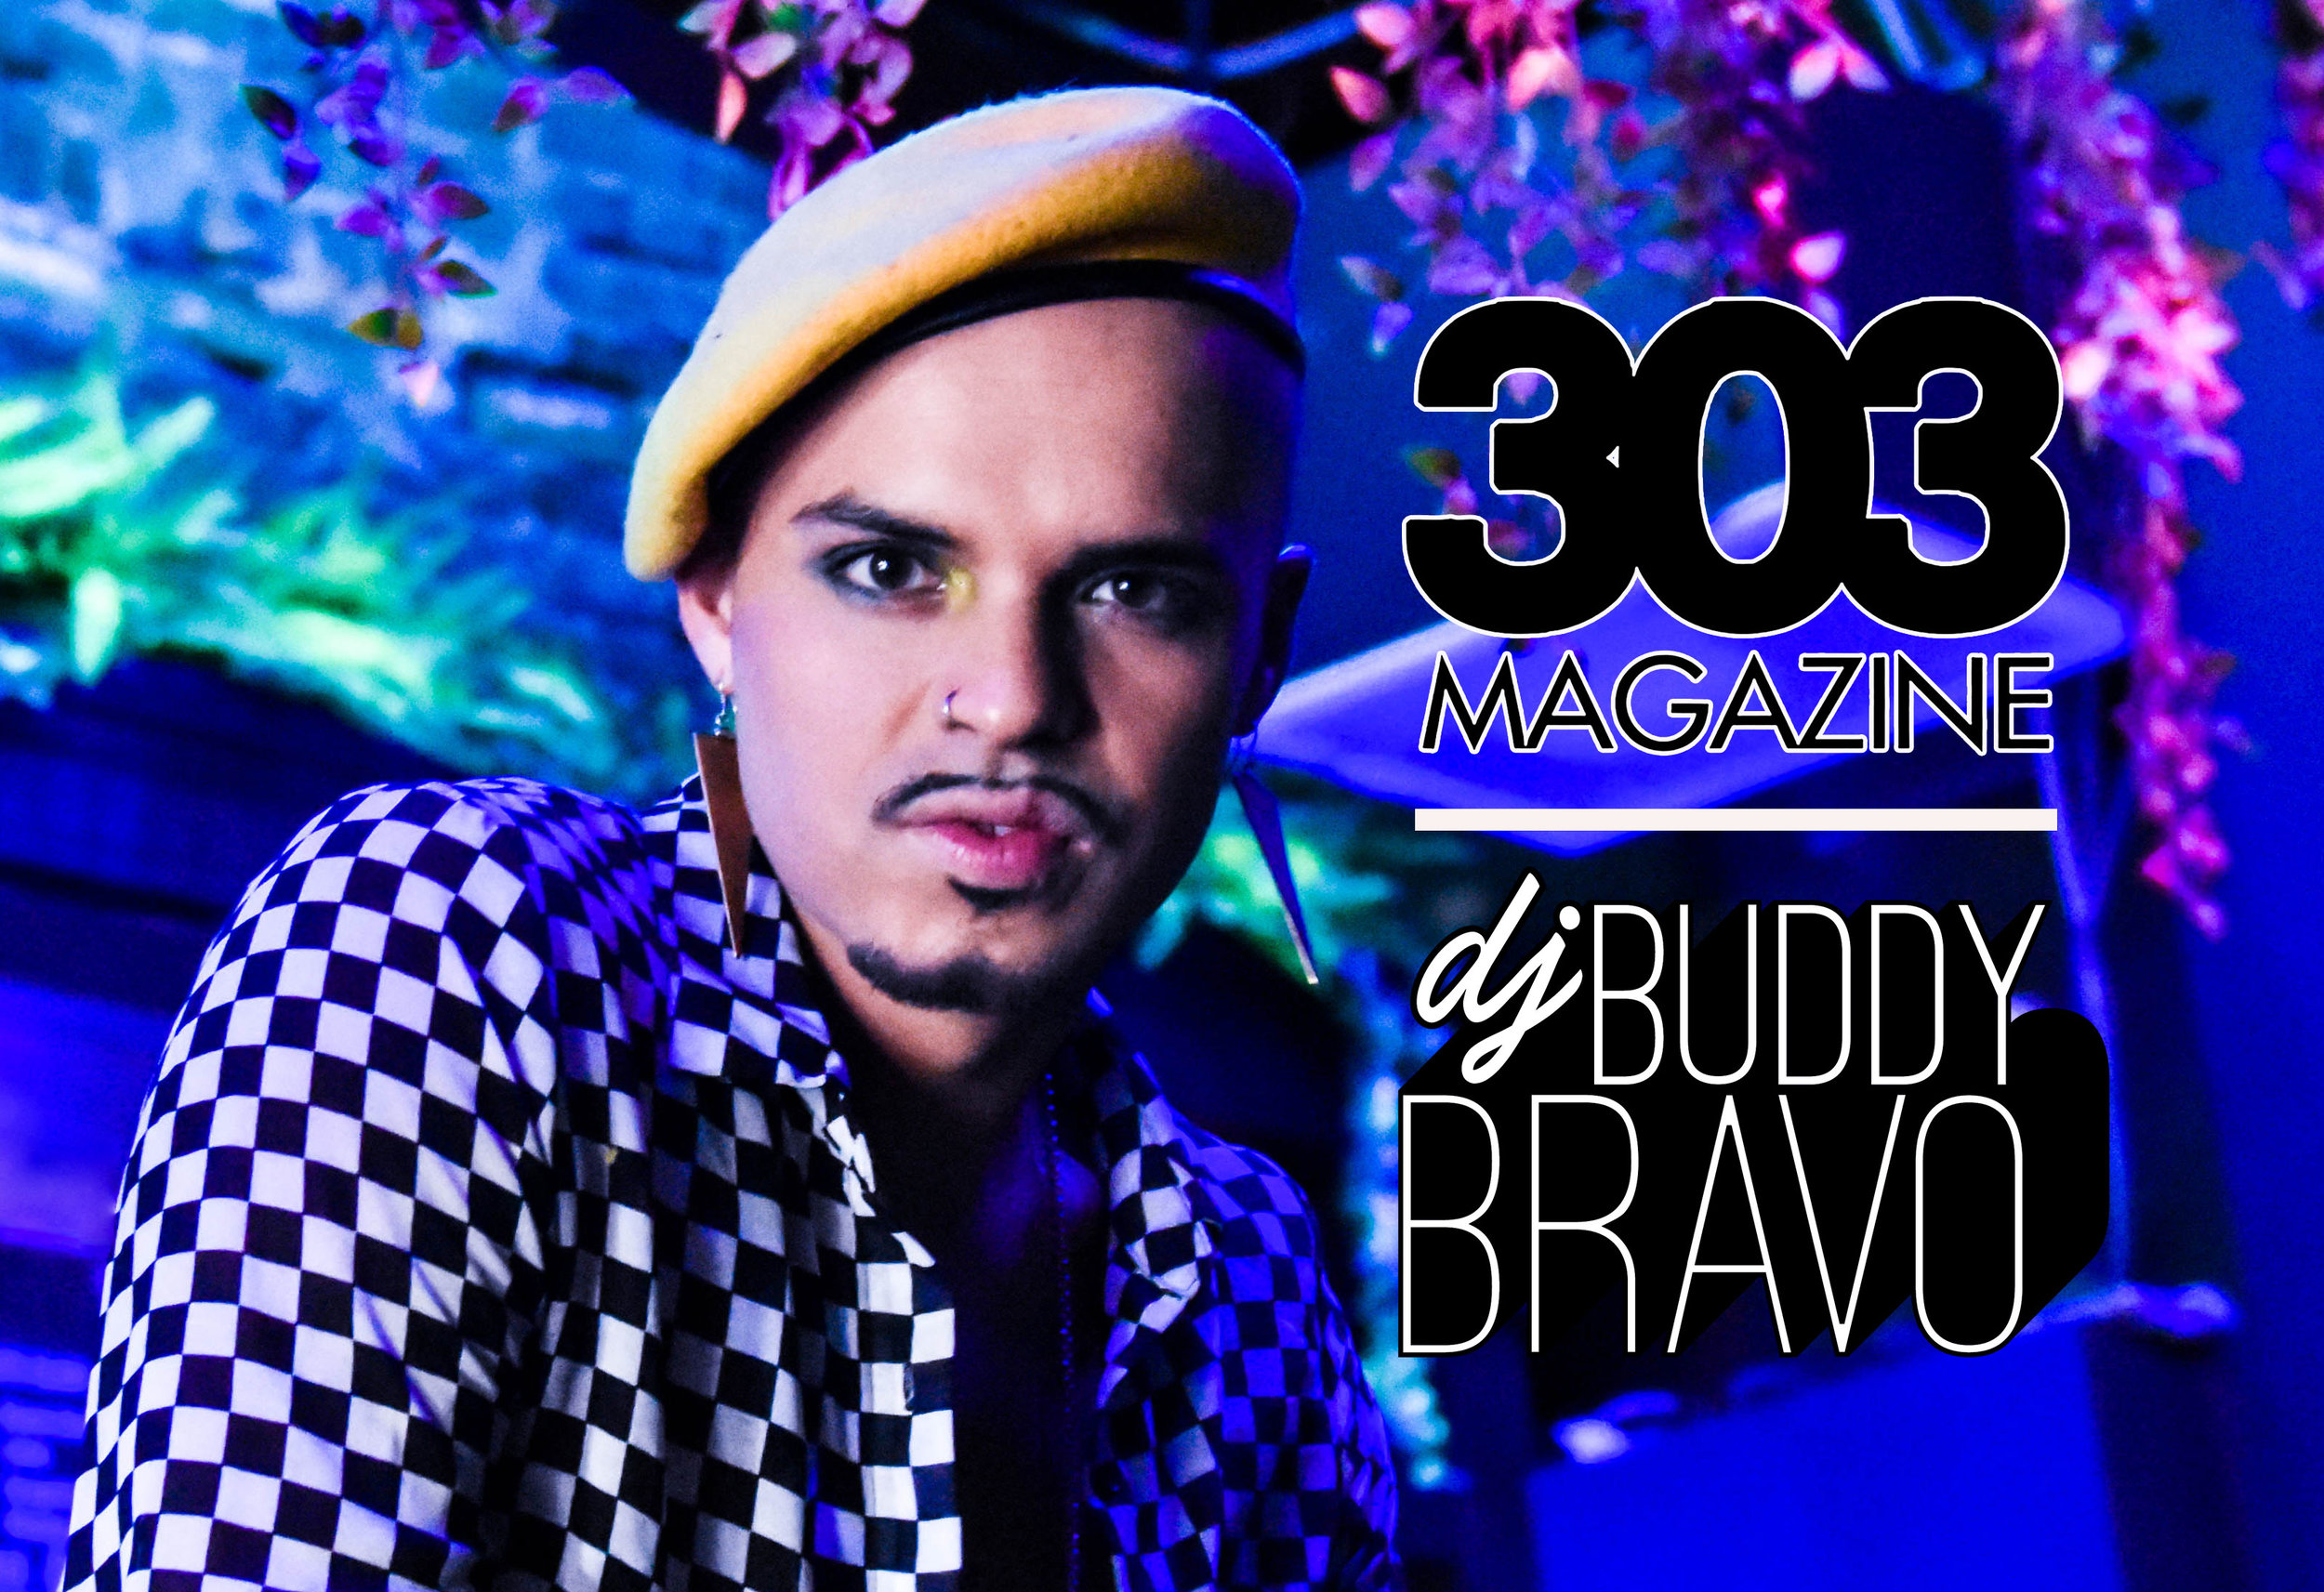 BuddyB-x-303-thumb.jpg